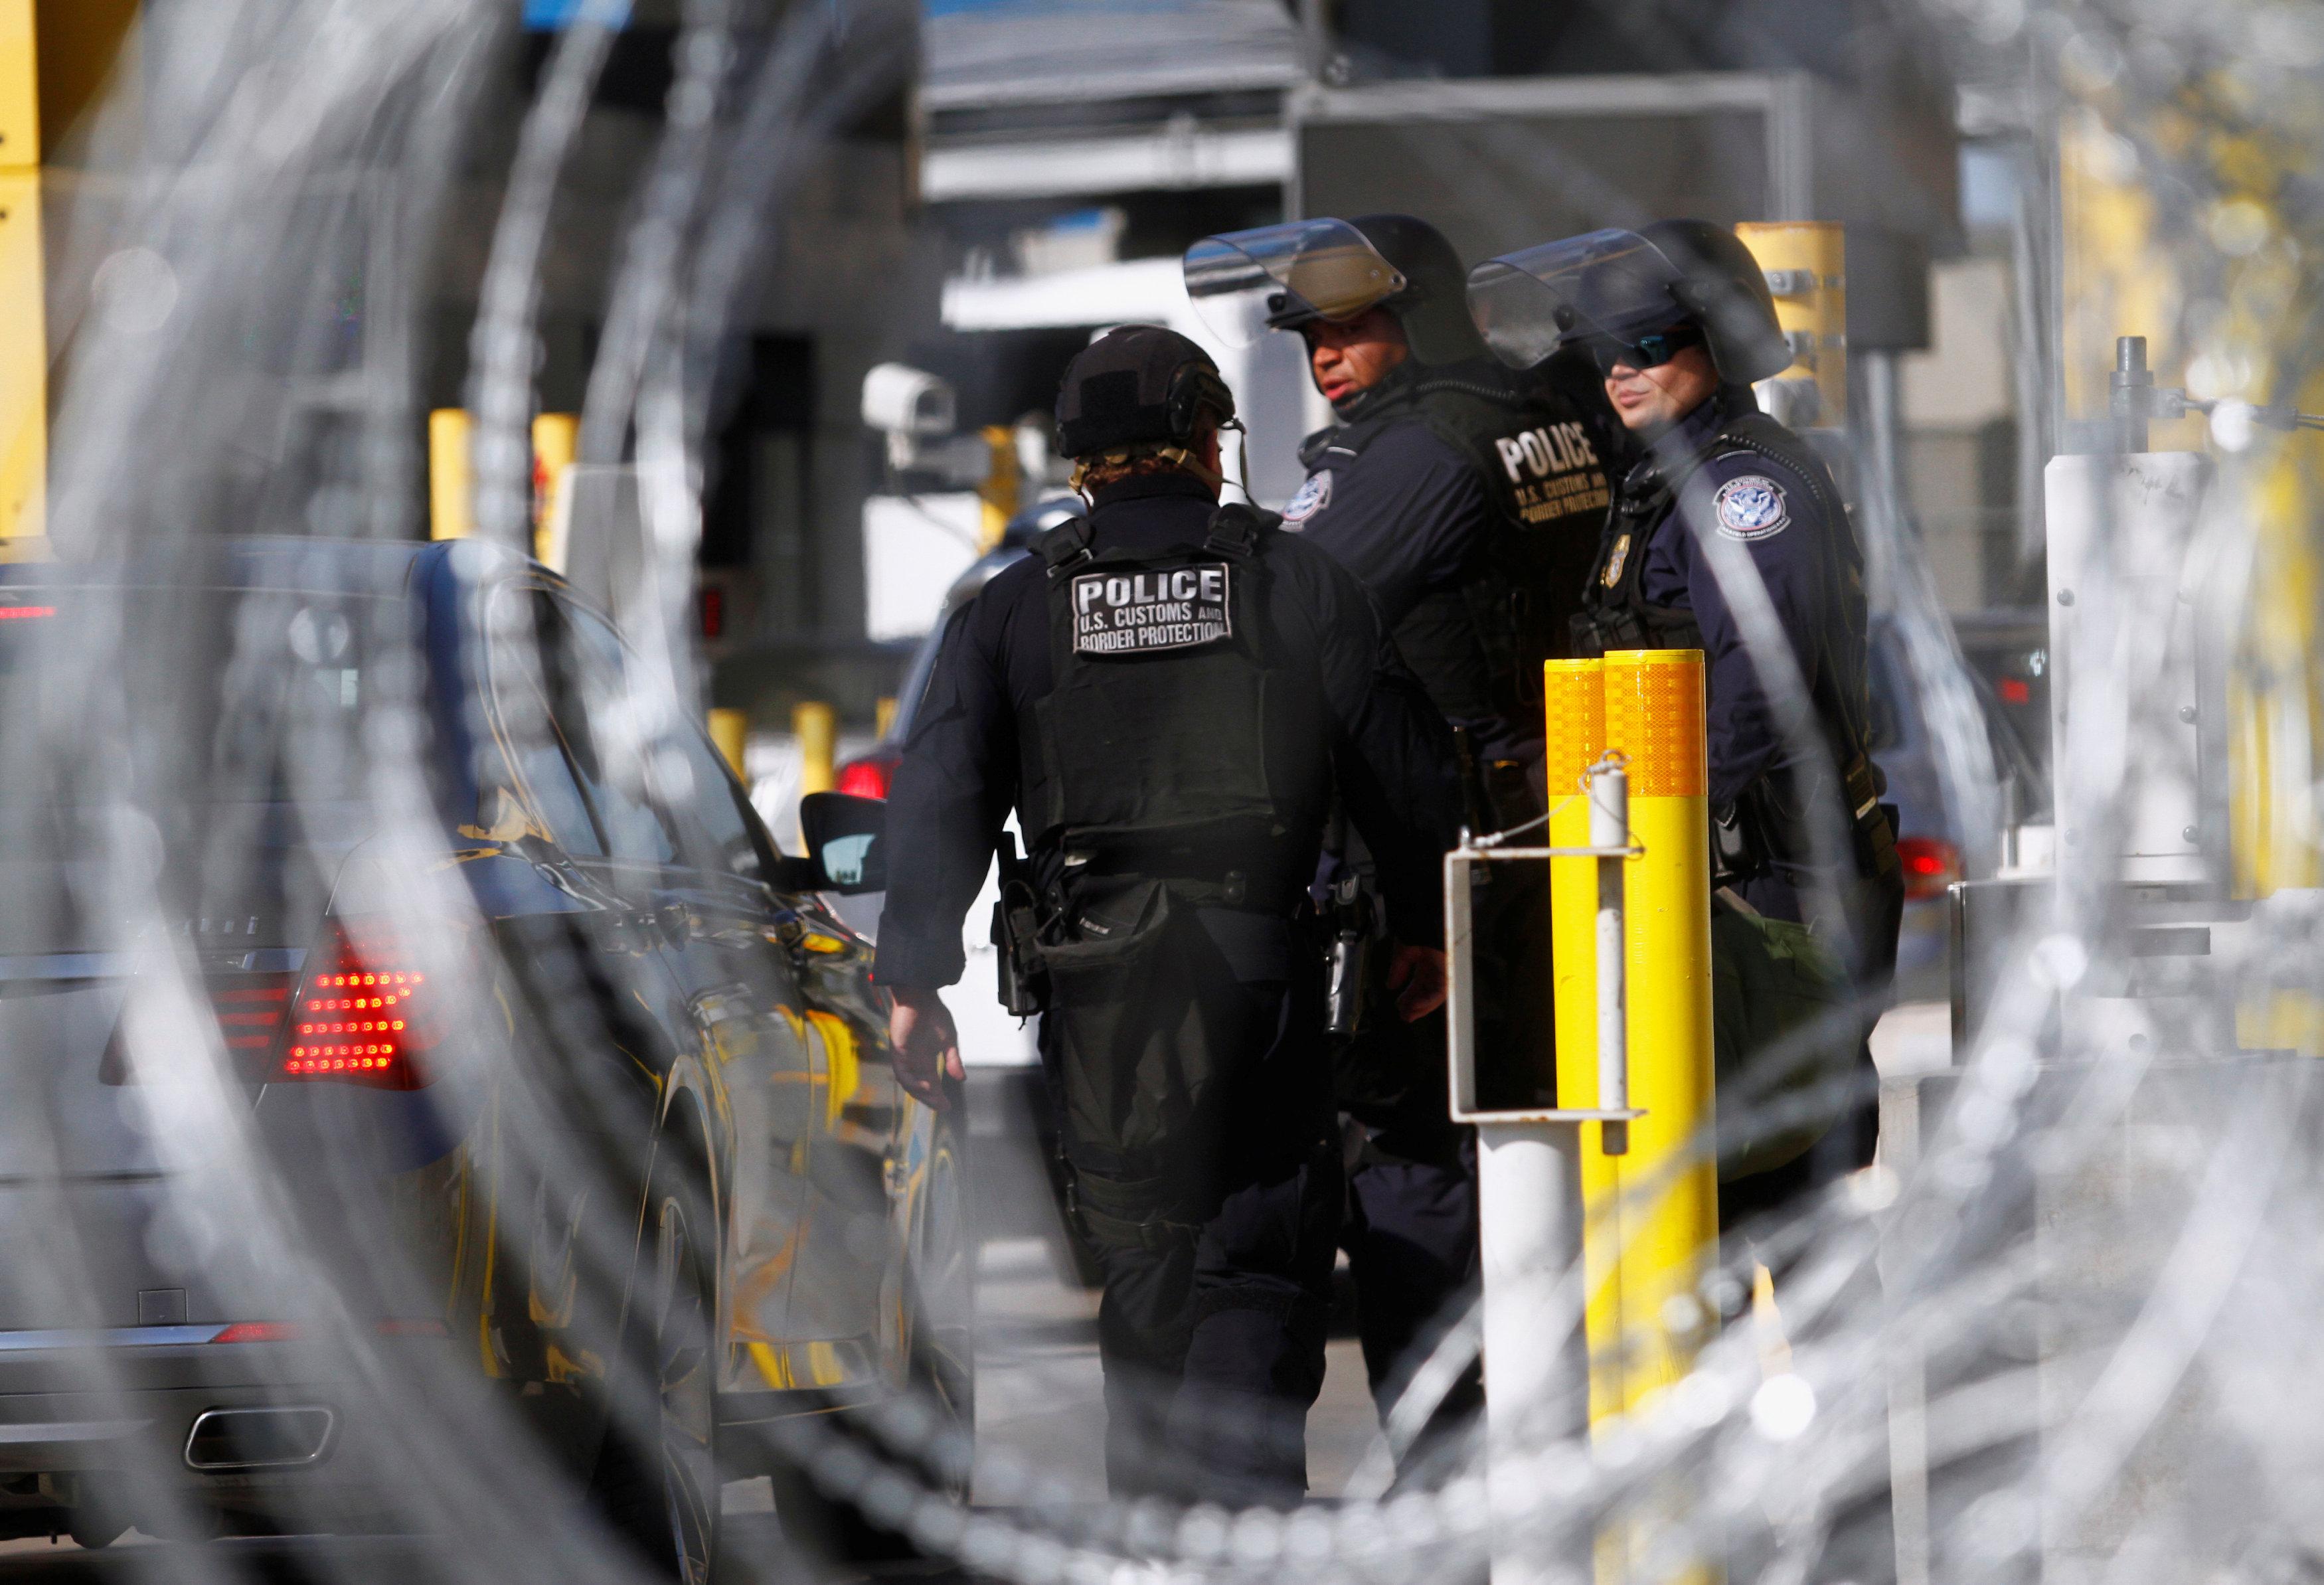 washingtonpost.com - Devlin Barrett, Mark Berman - FBI, federal agents see cases hampered, lives rattled as shutdown continues